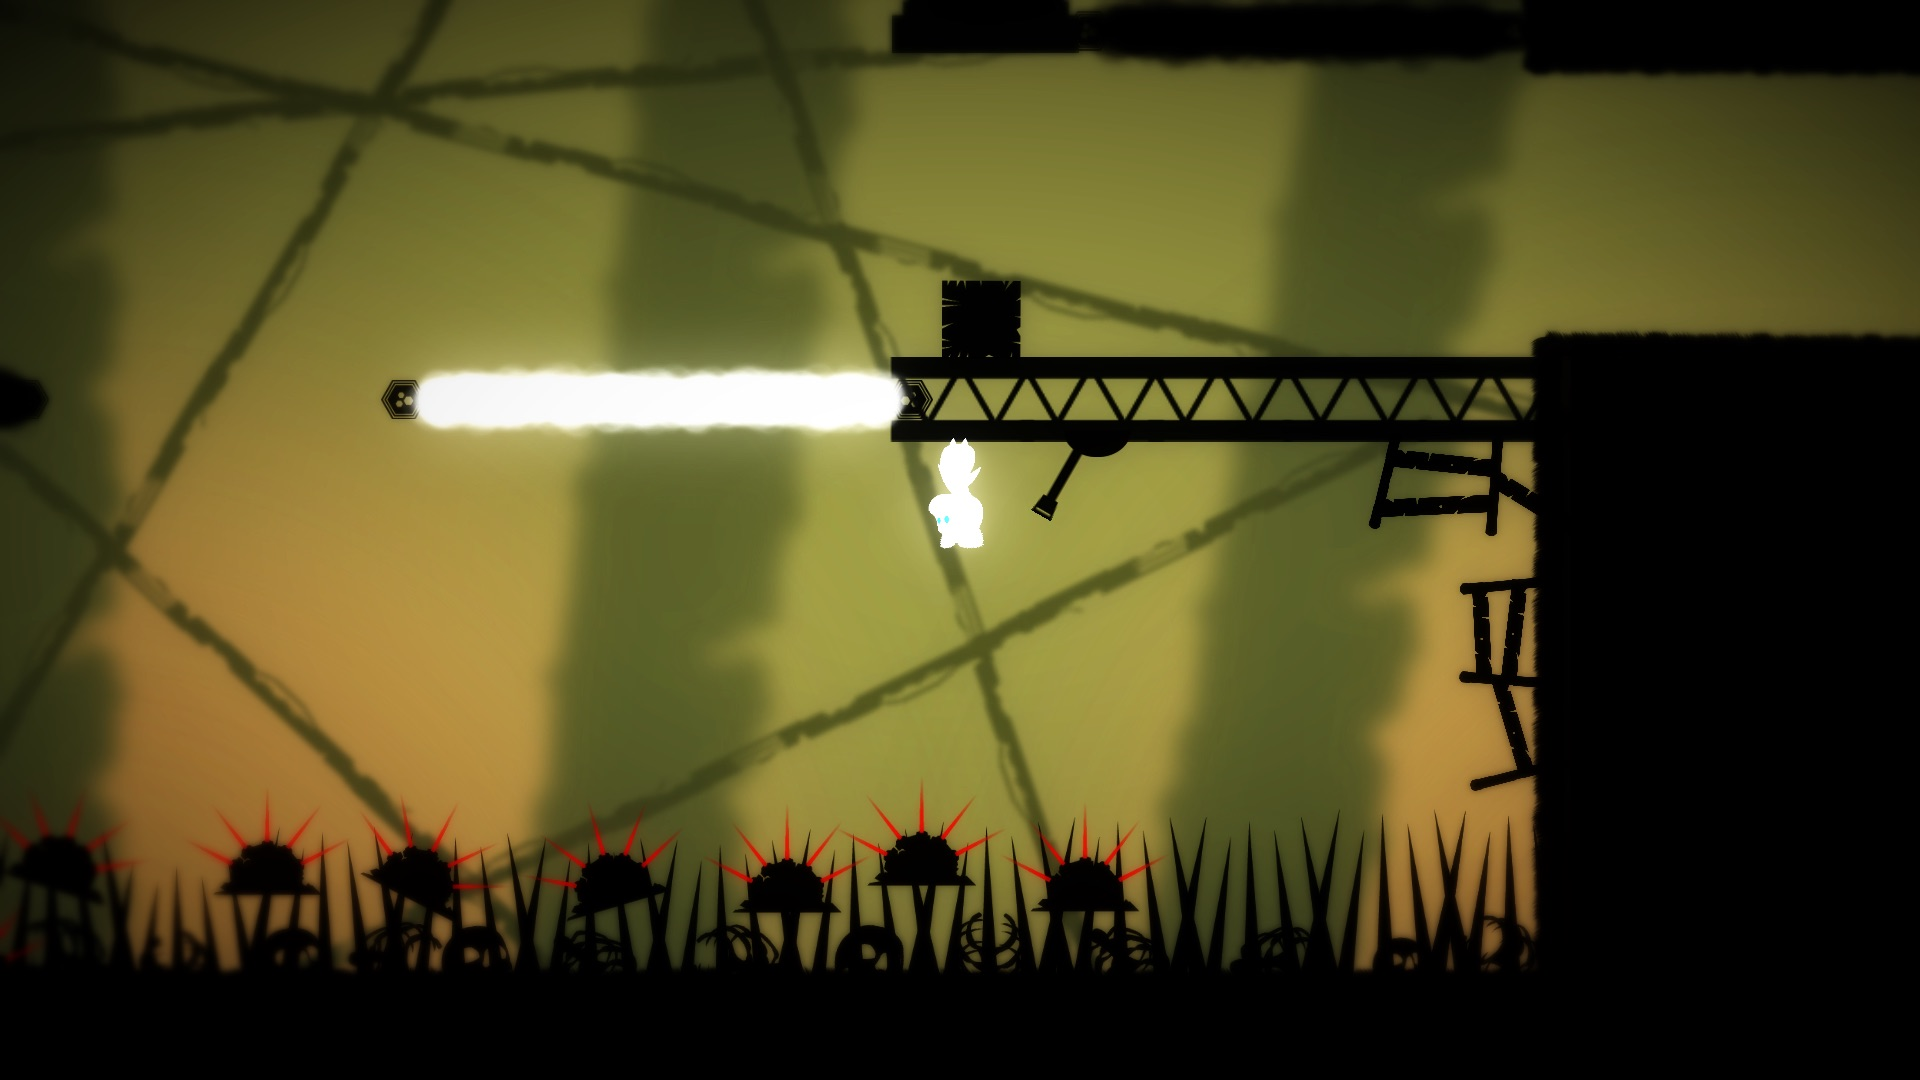 Soulless: Ray Of Hope screenshot